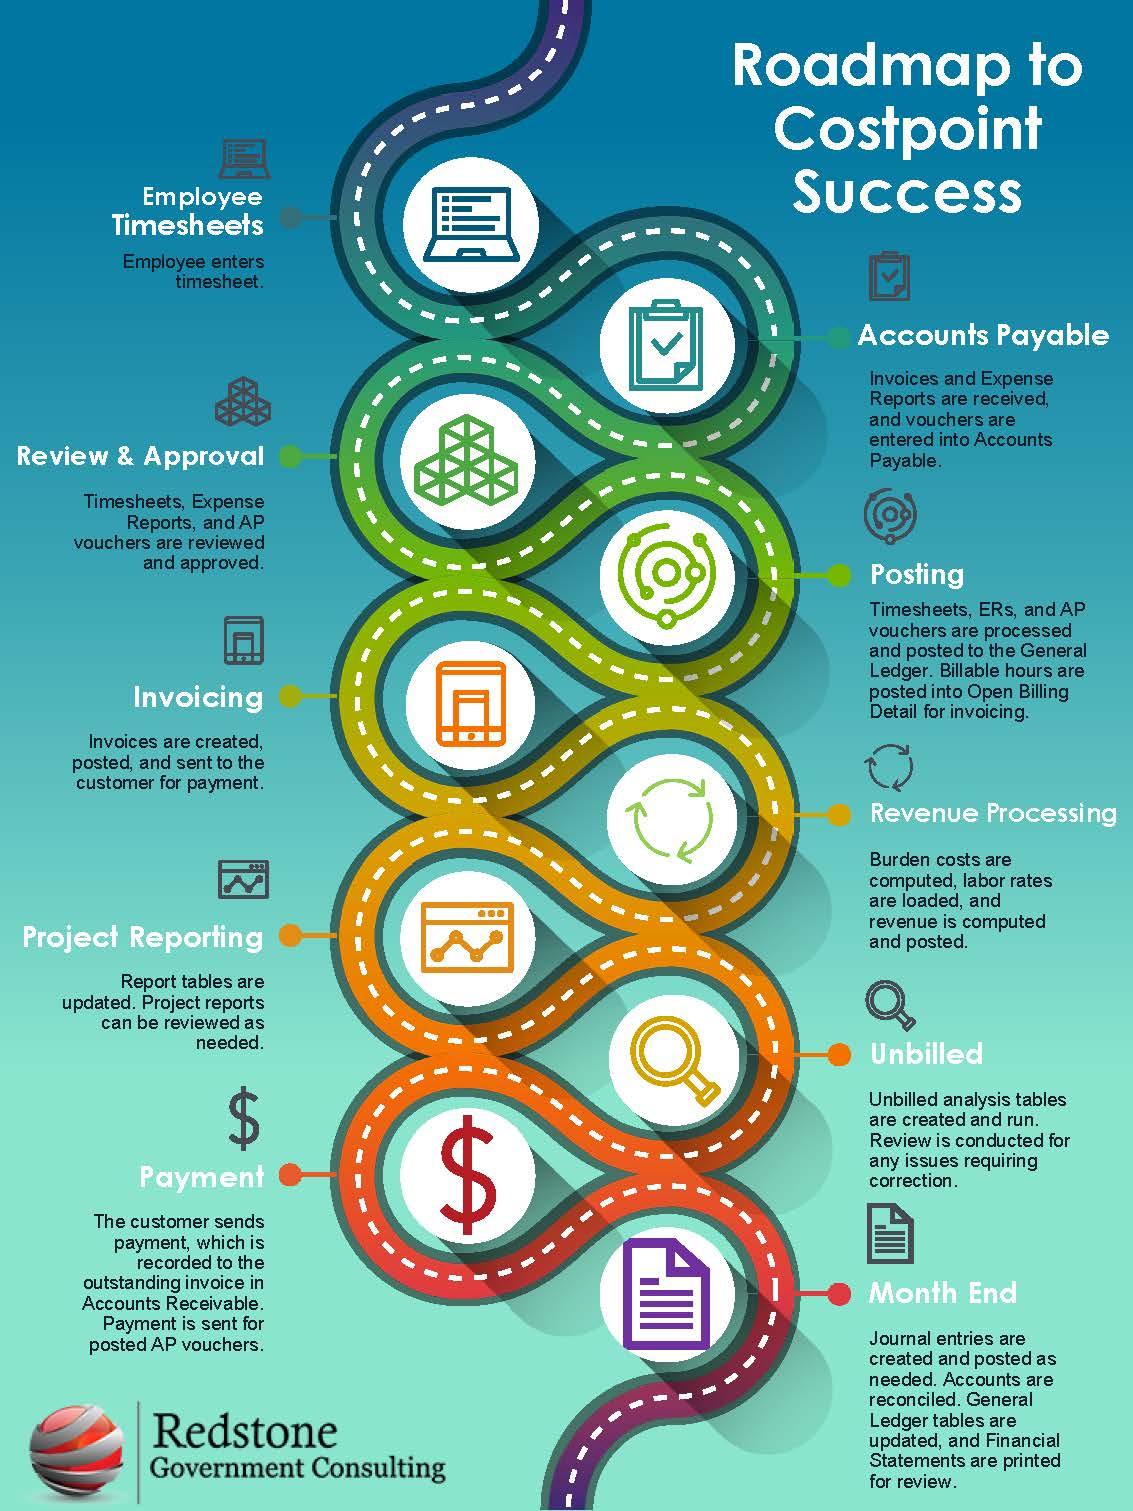 Costpoint Roadmap to Success